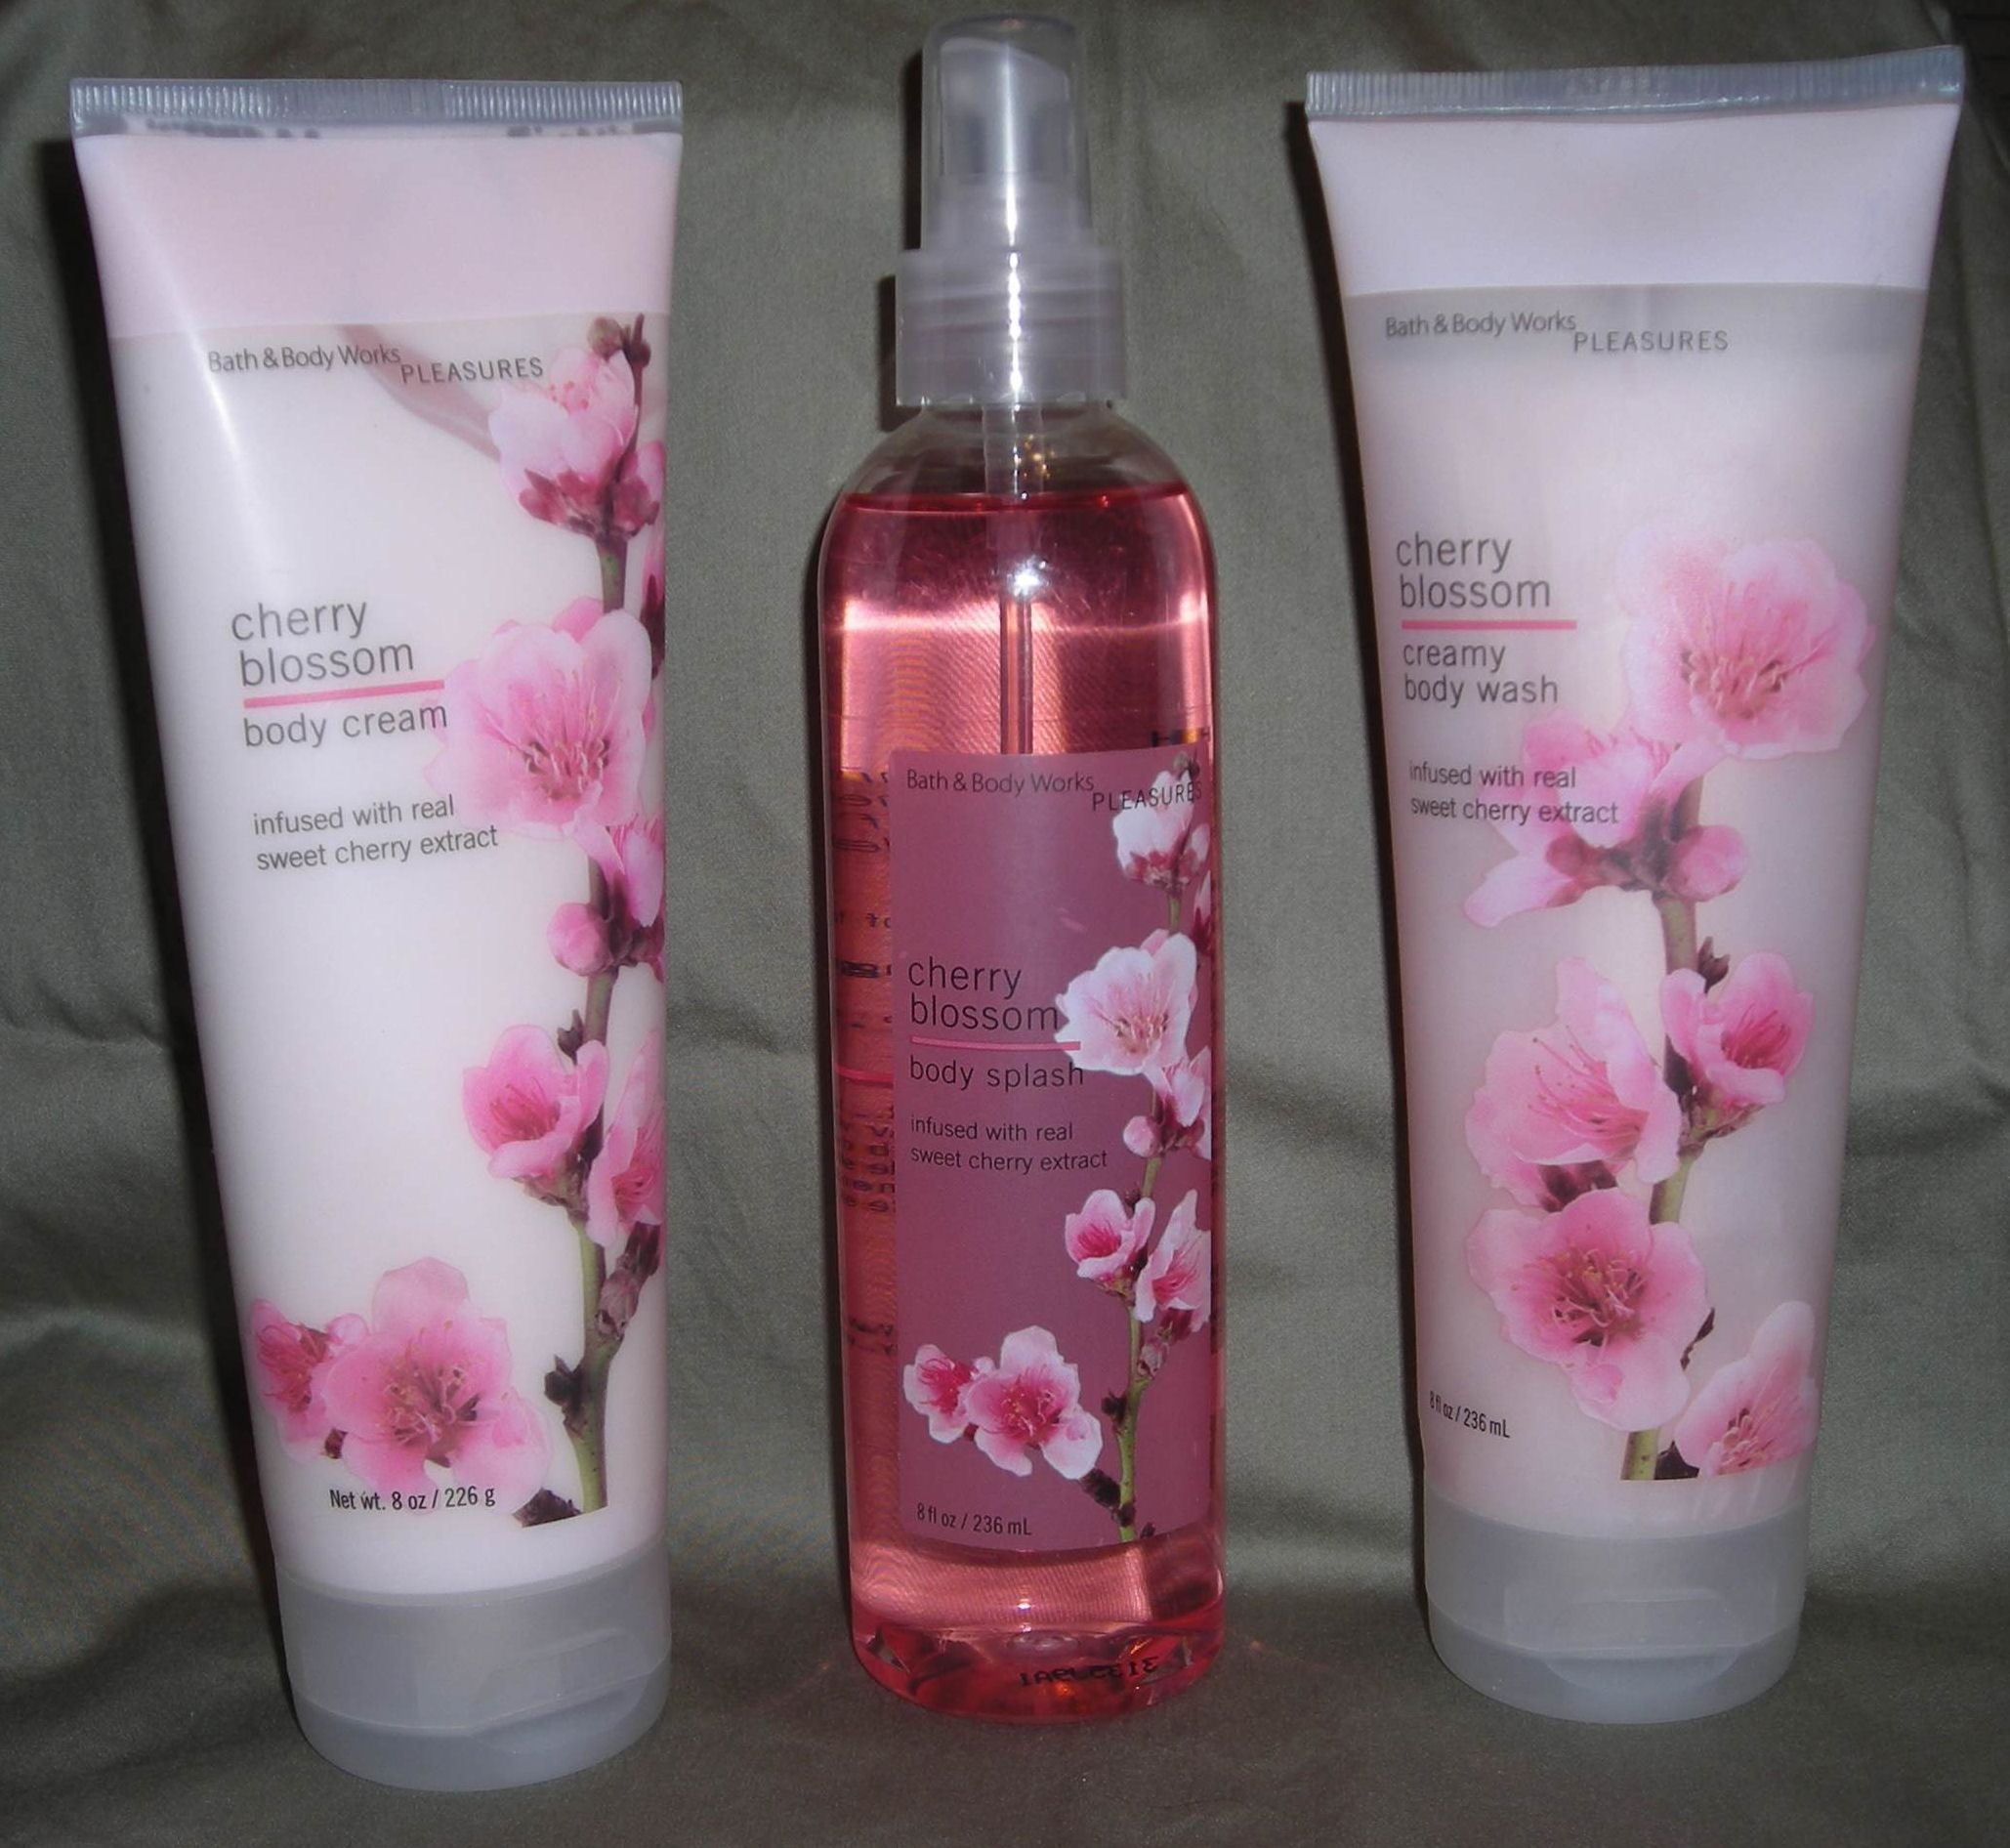 Cherry Blossom Bath And Body Works Smells Fabulous Aimee Bath And Bodyworks Bath And Body Works Bath And Body